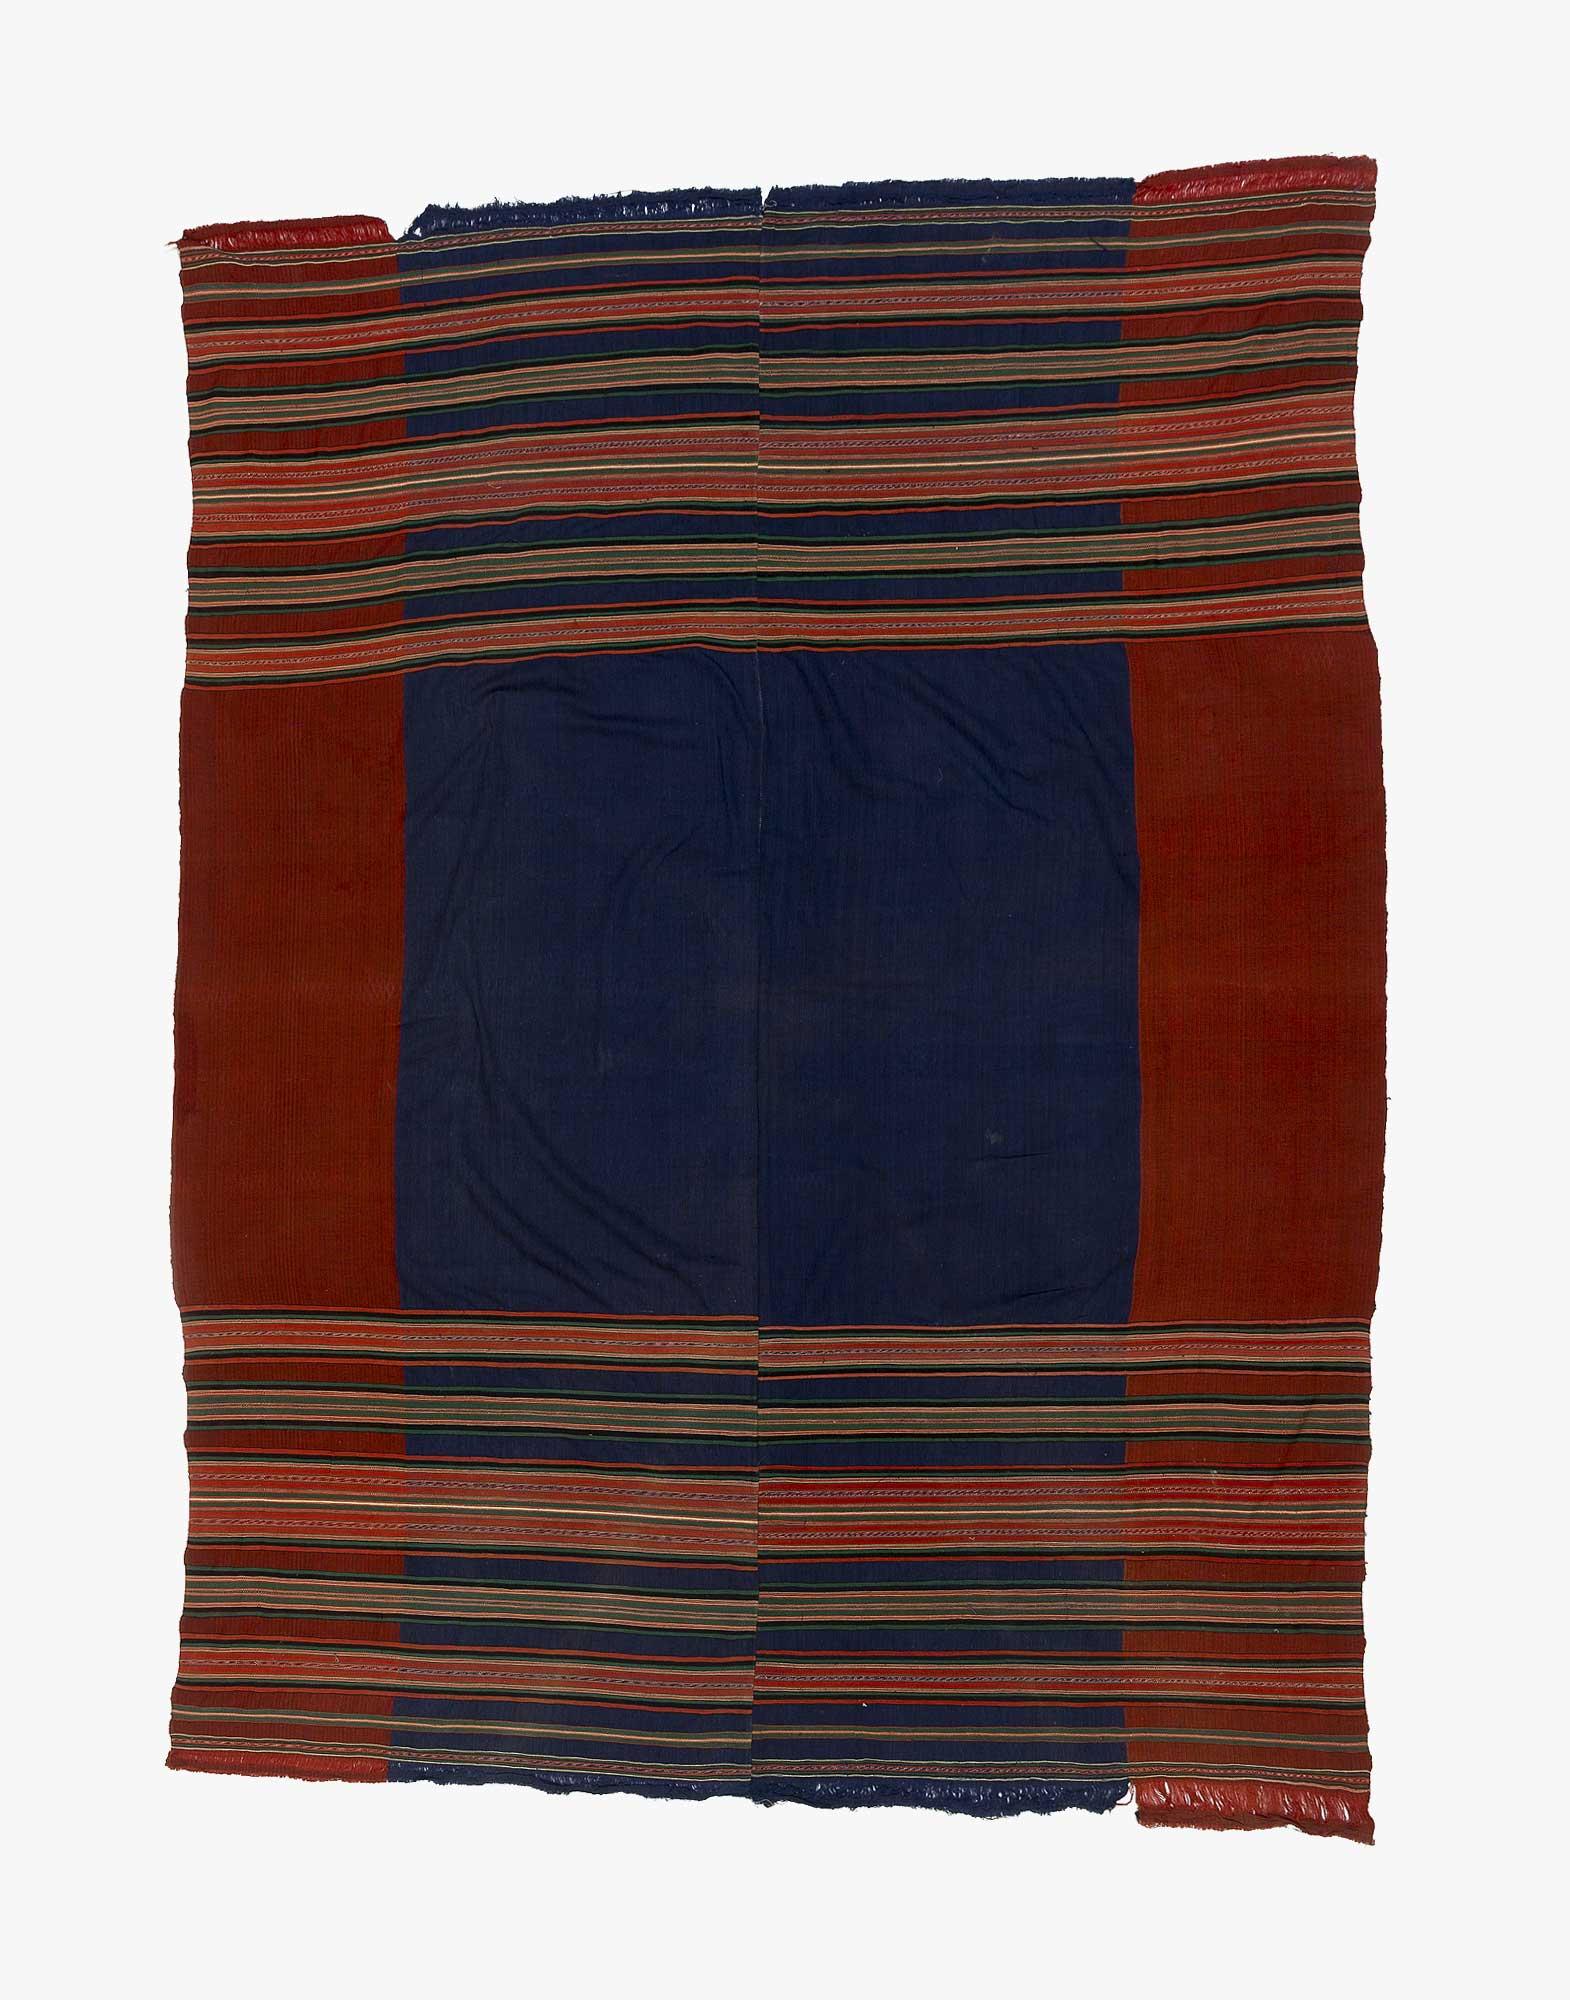 Afghanistan Belouchi Tribe Village Textile Dress